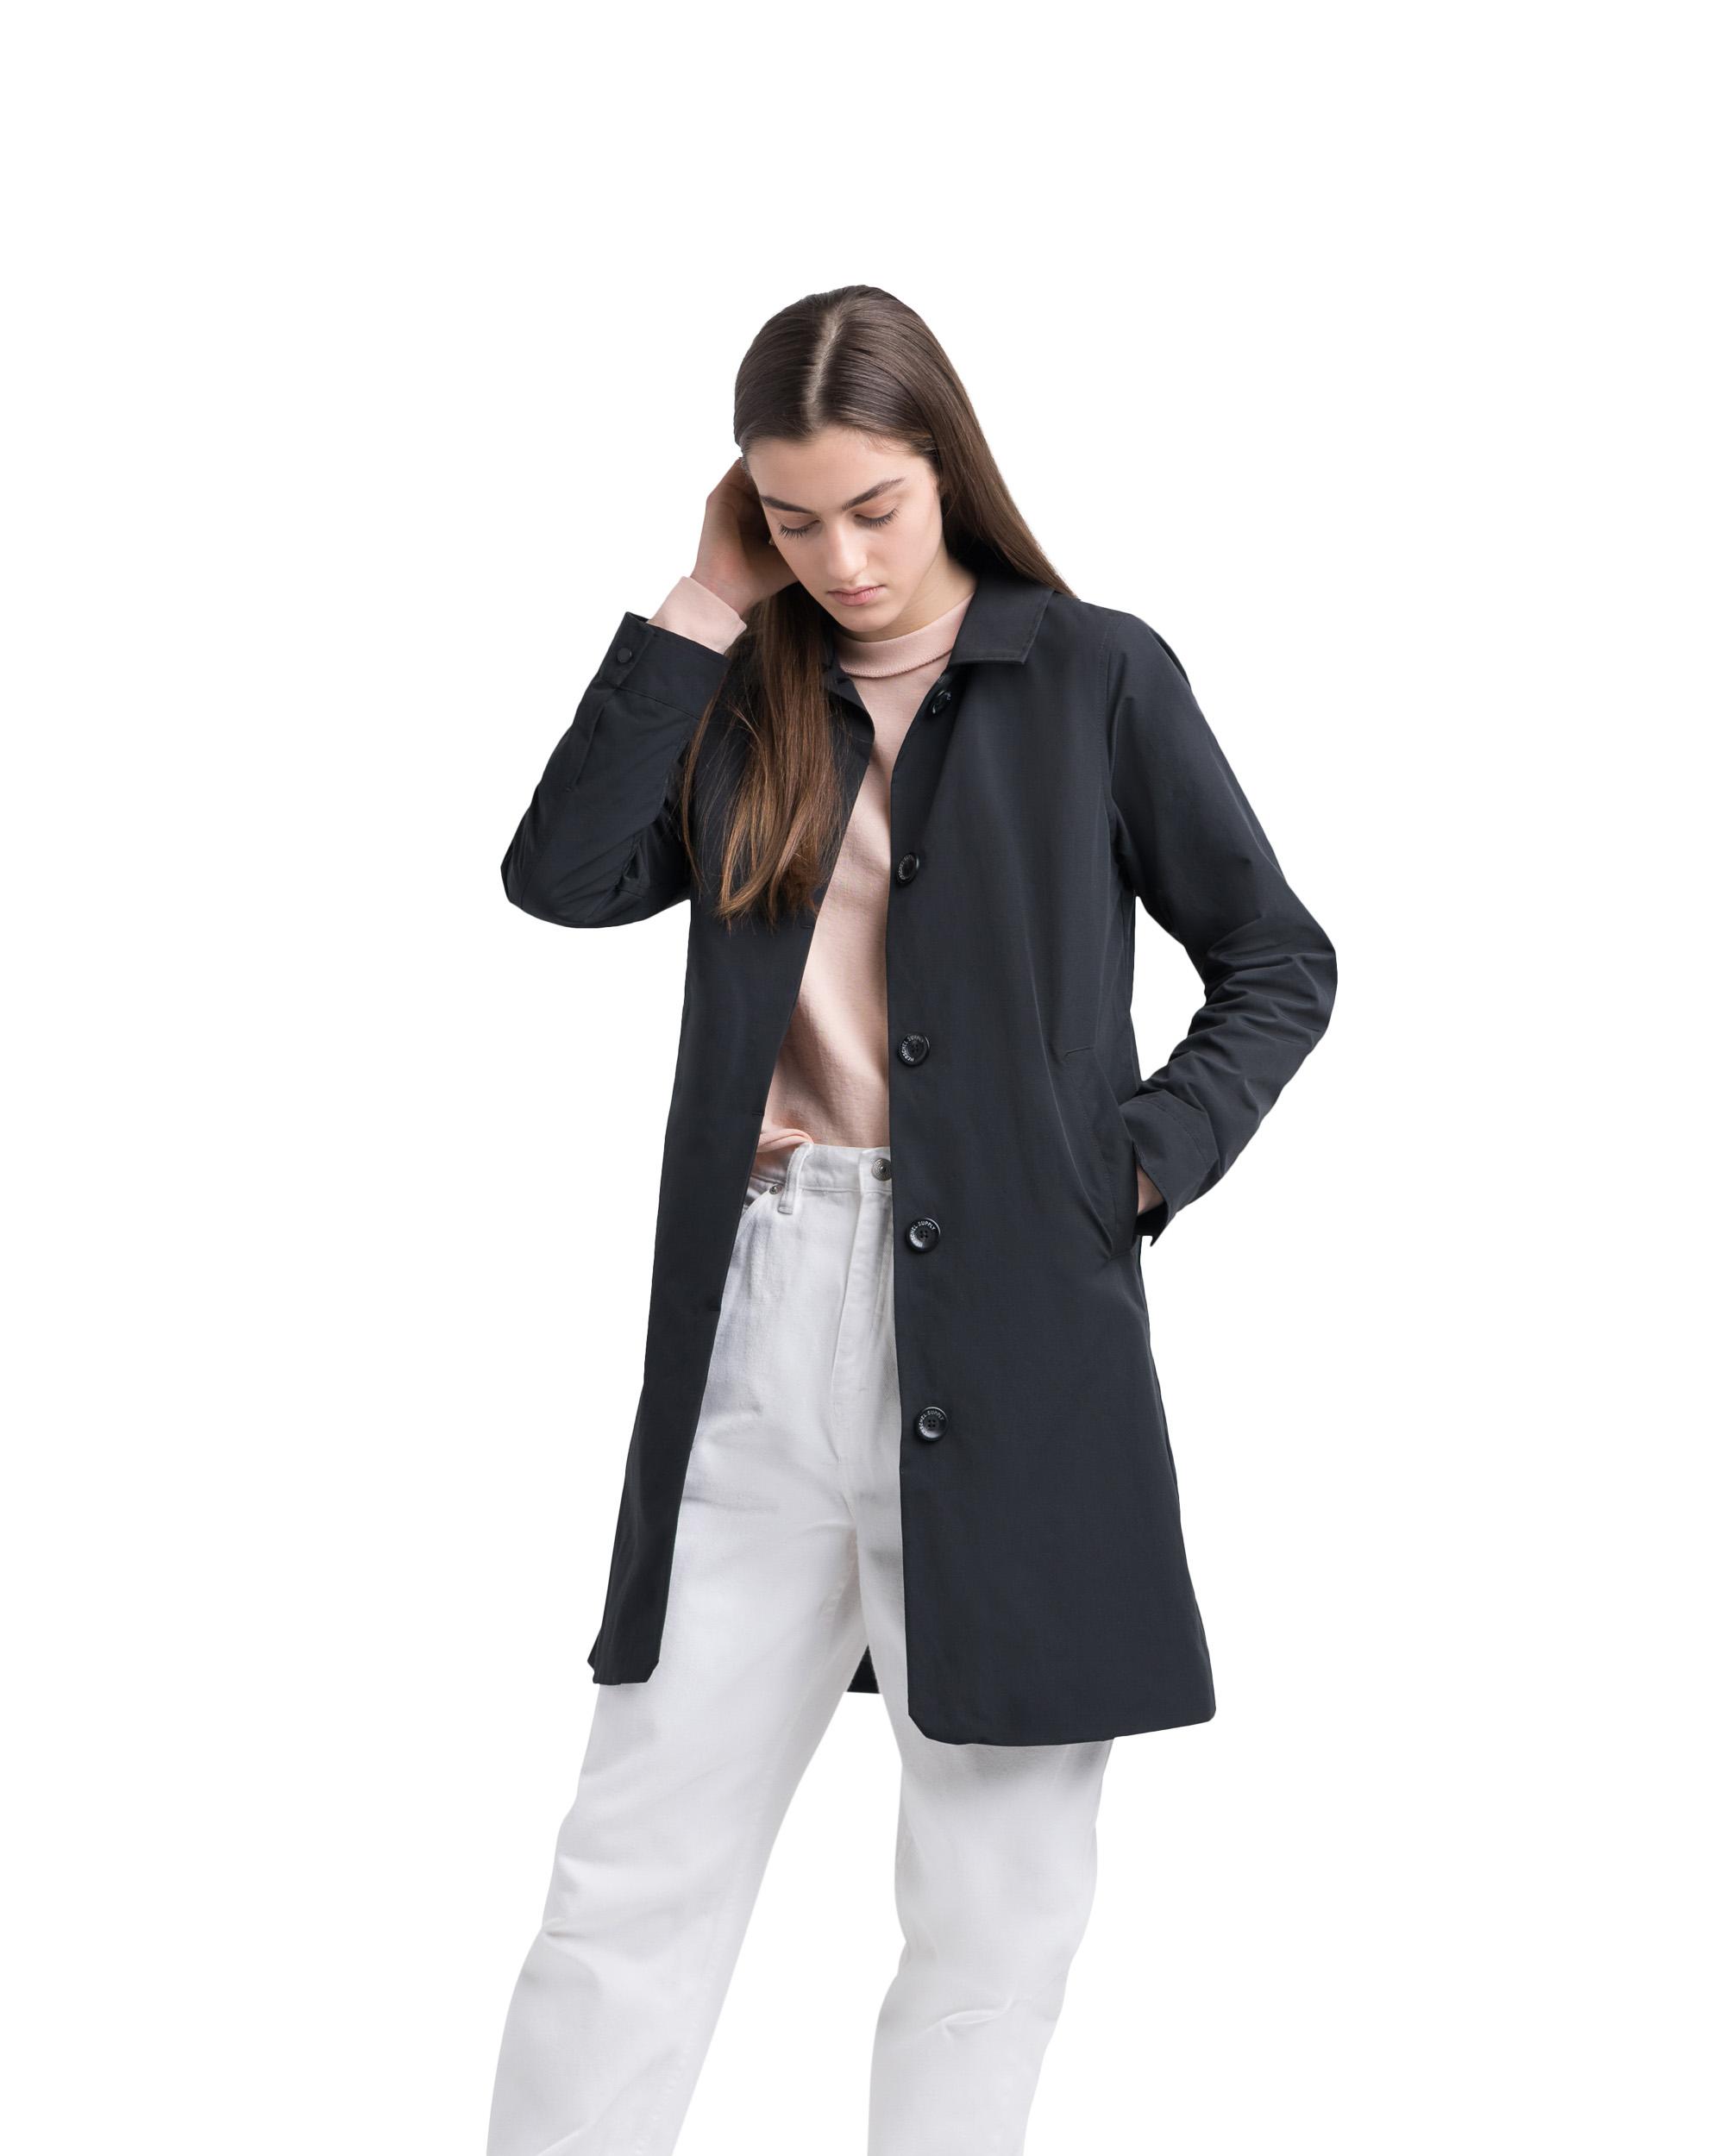 new concept 205f2 d0bc1 Mac Jacket Womens | Herschel Supply Company